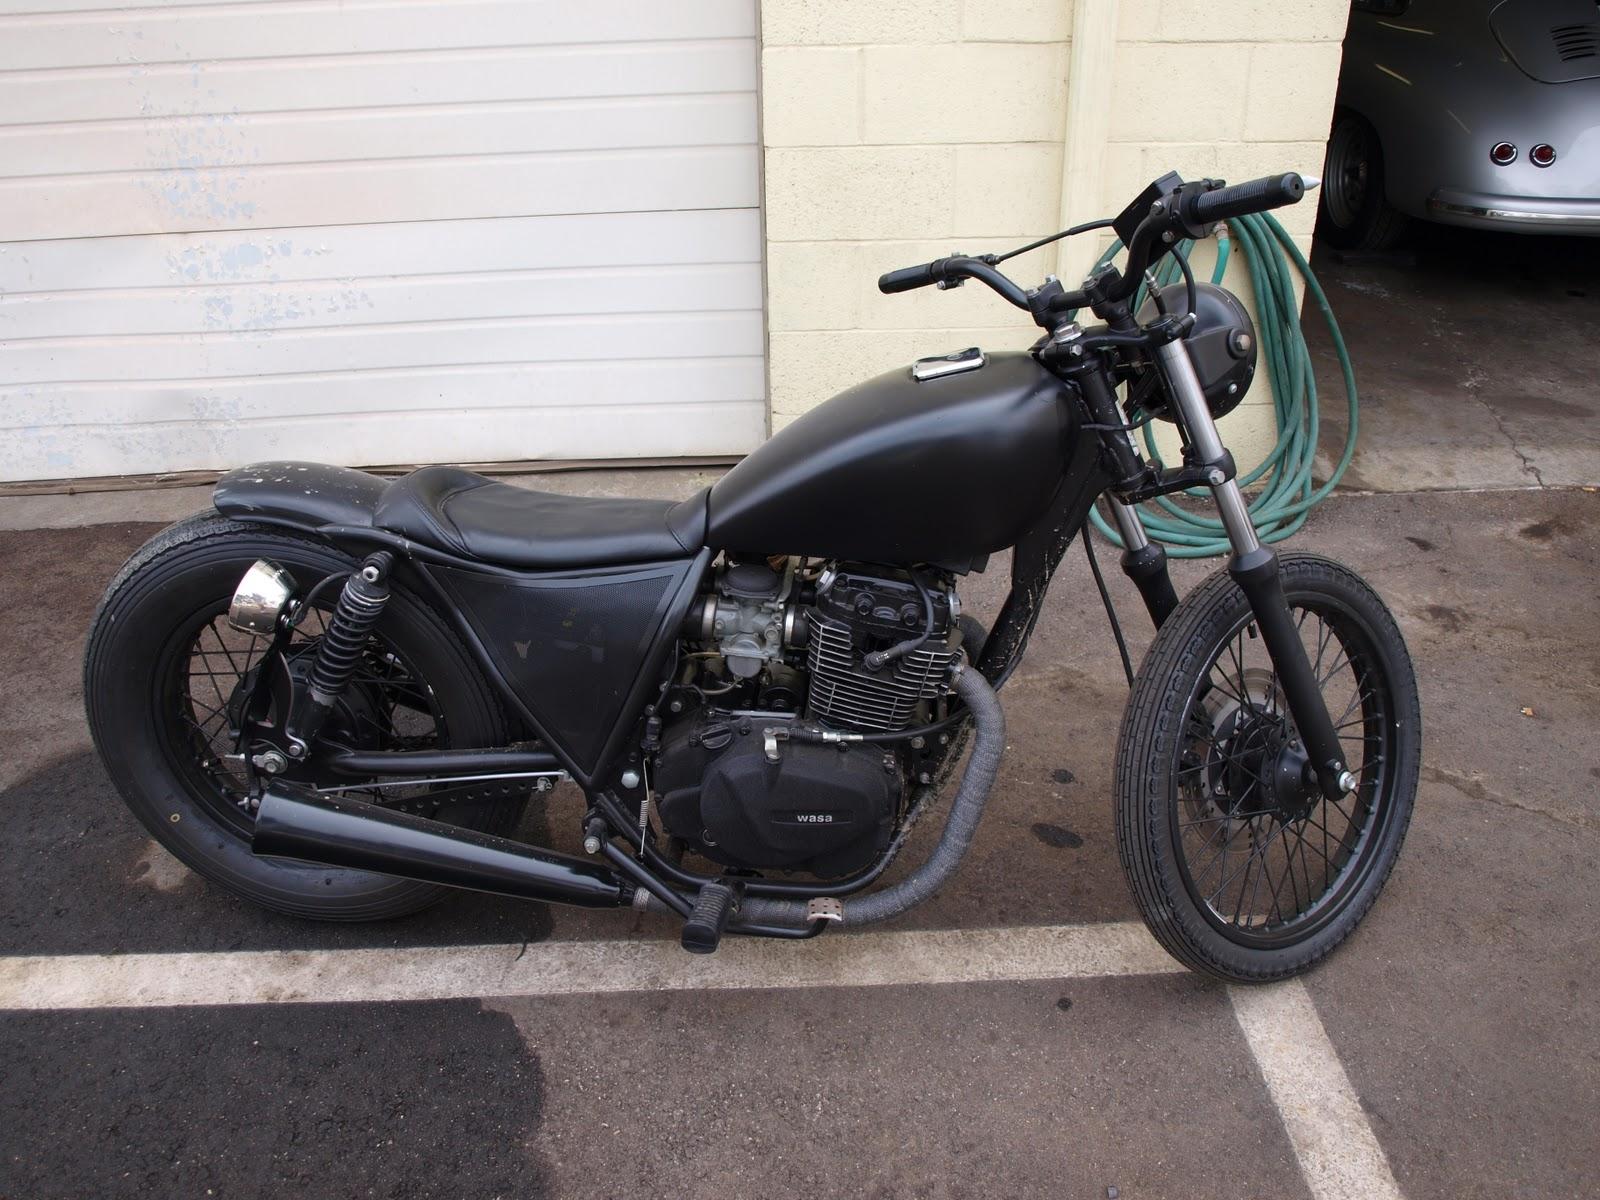 Vintage Revolutions  Kawasaki 305 Brat Style  The Wasa